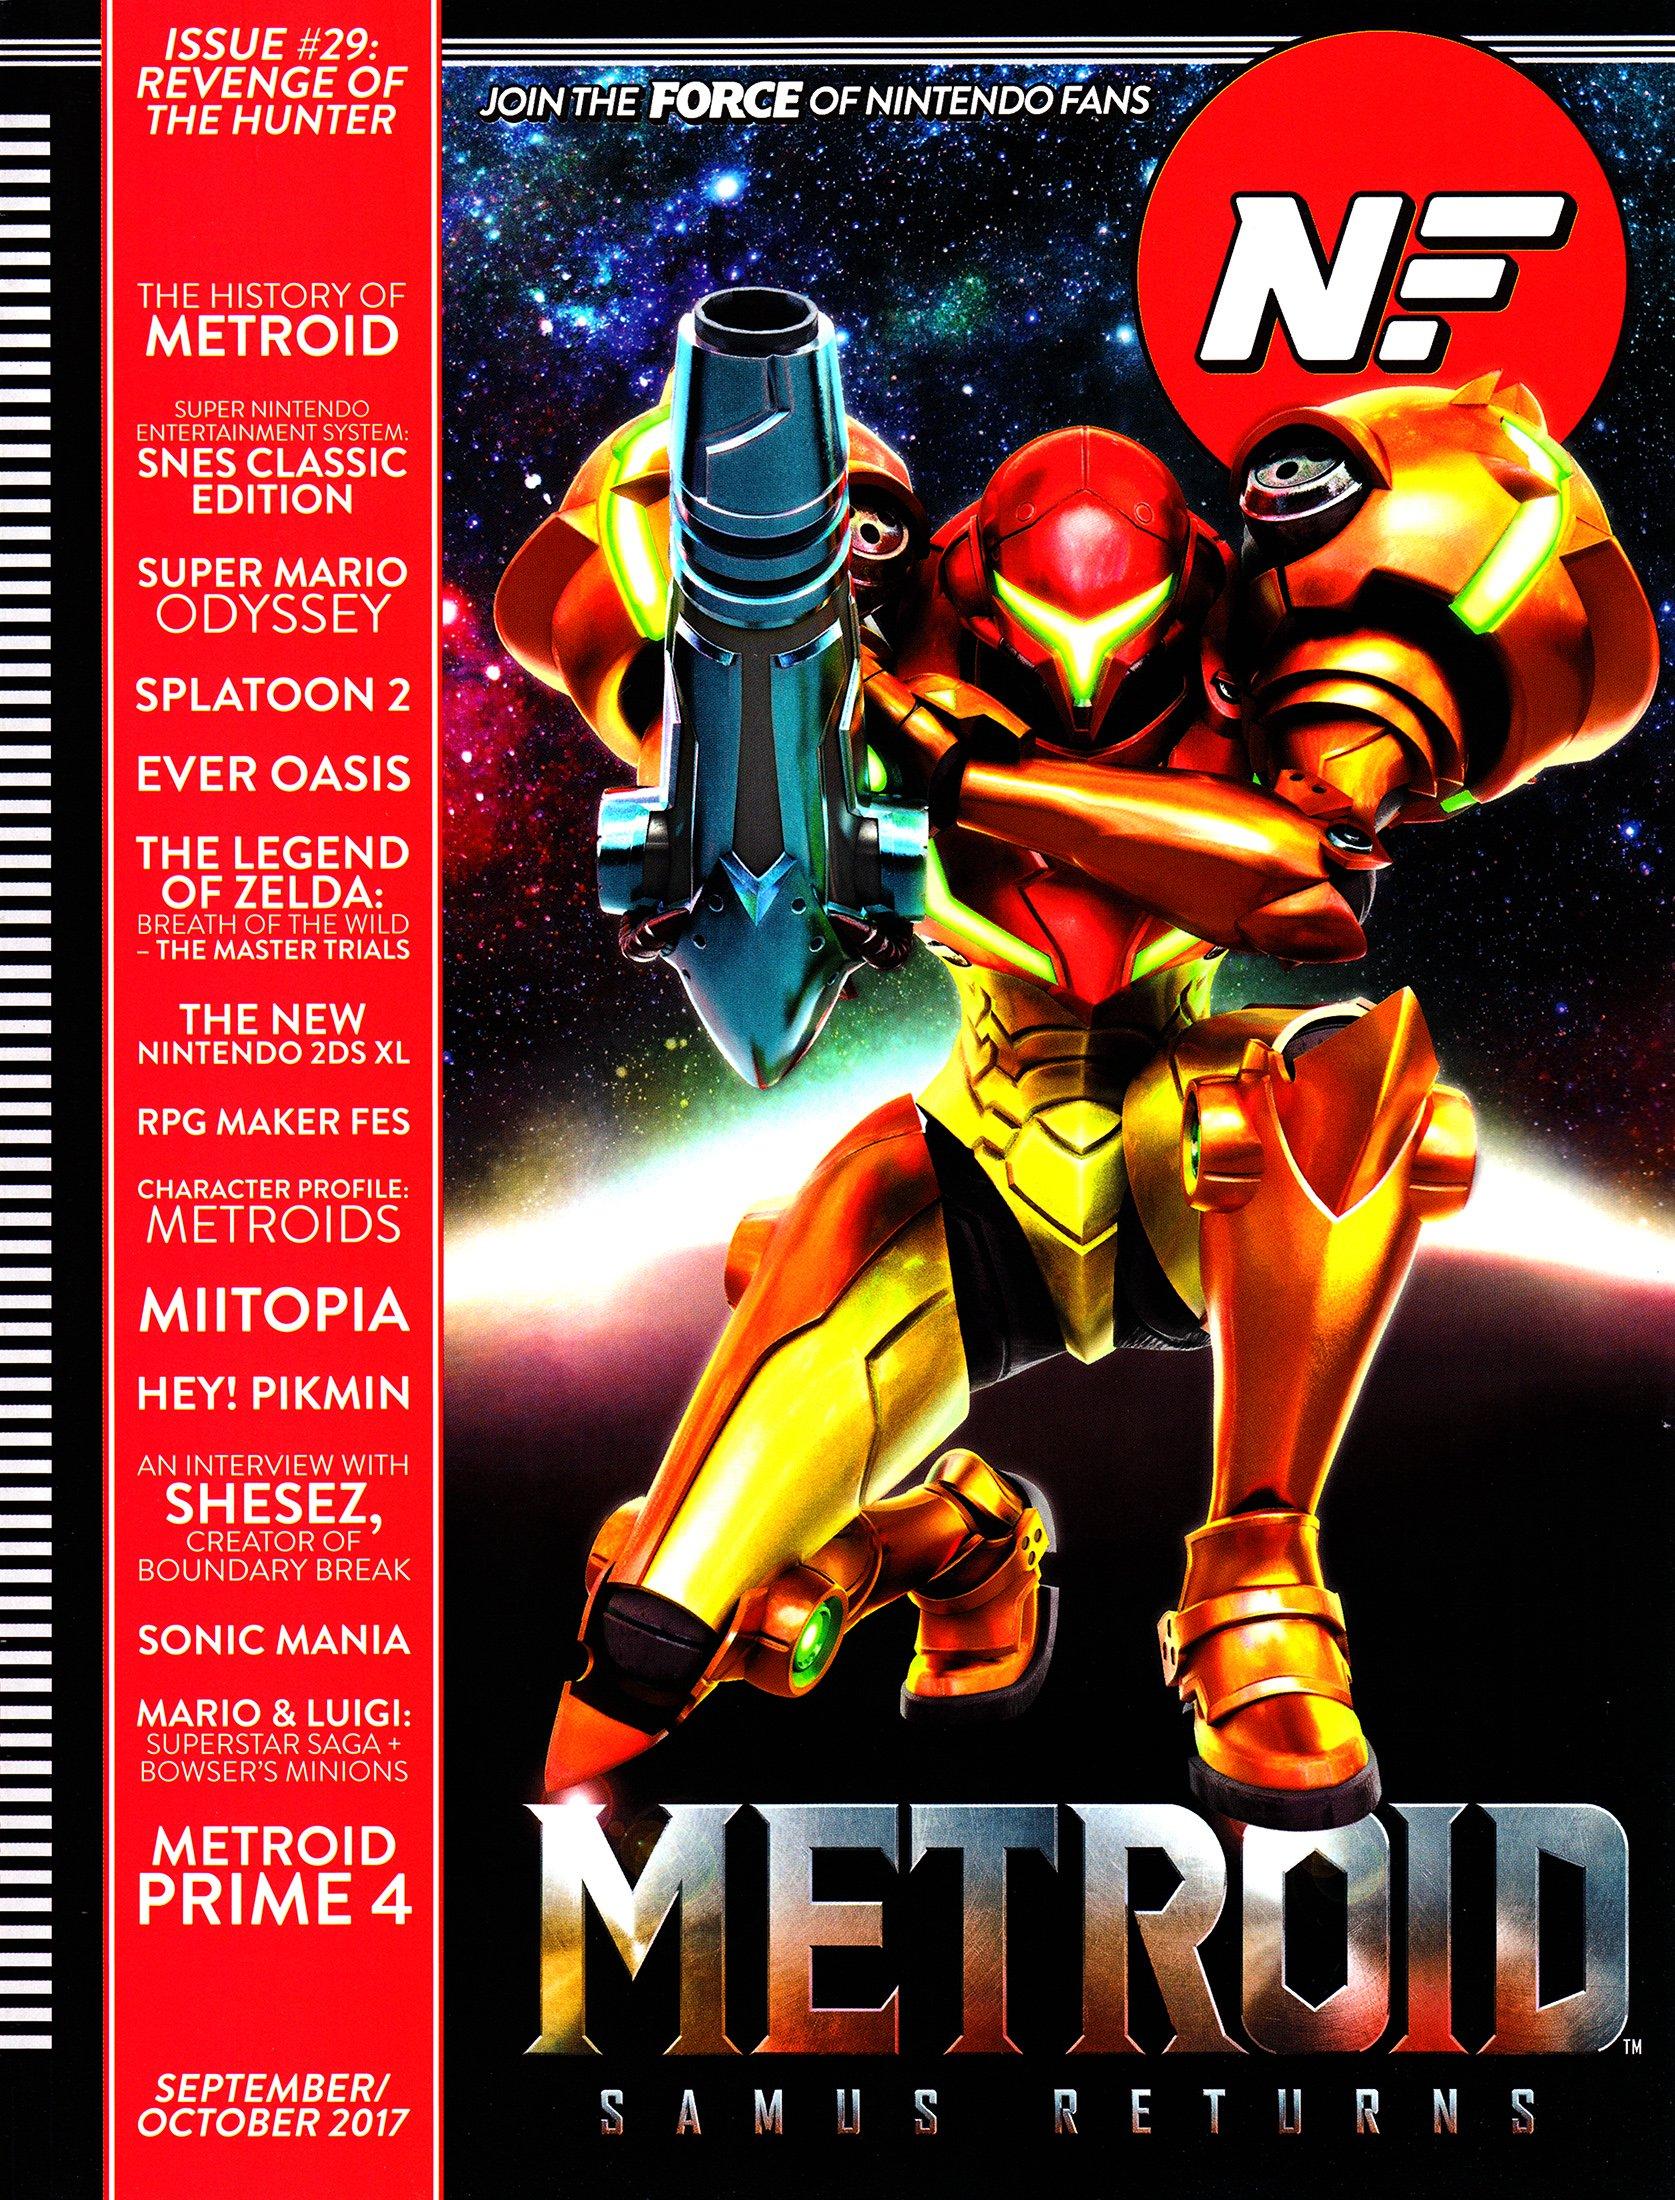 Nintendo Force Issue 29 September/October 2017